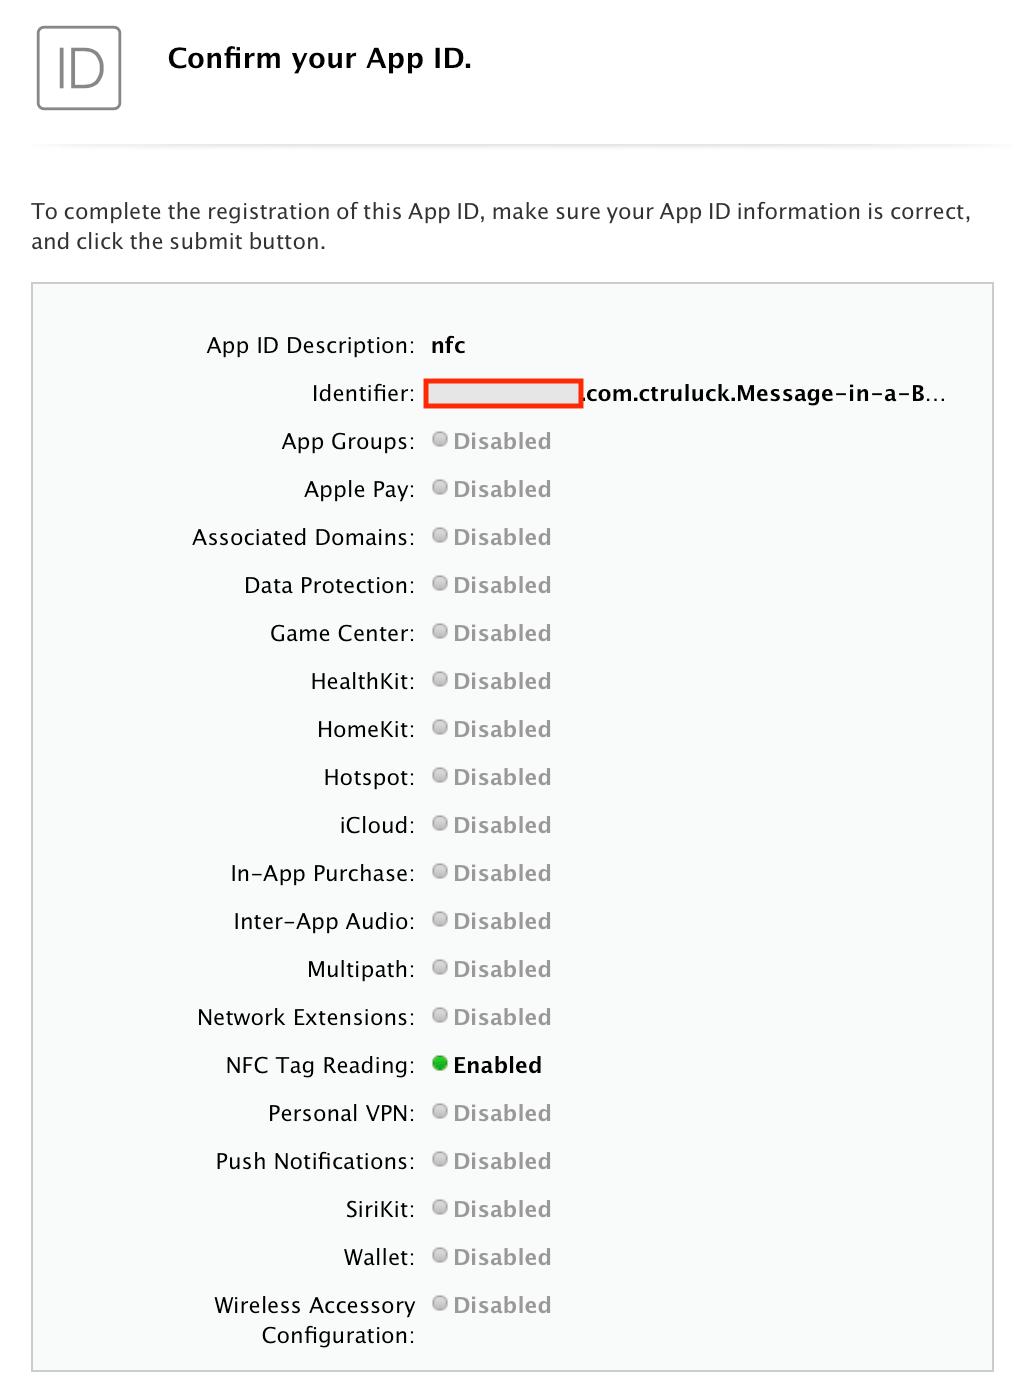 app-id-confirm